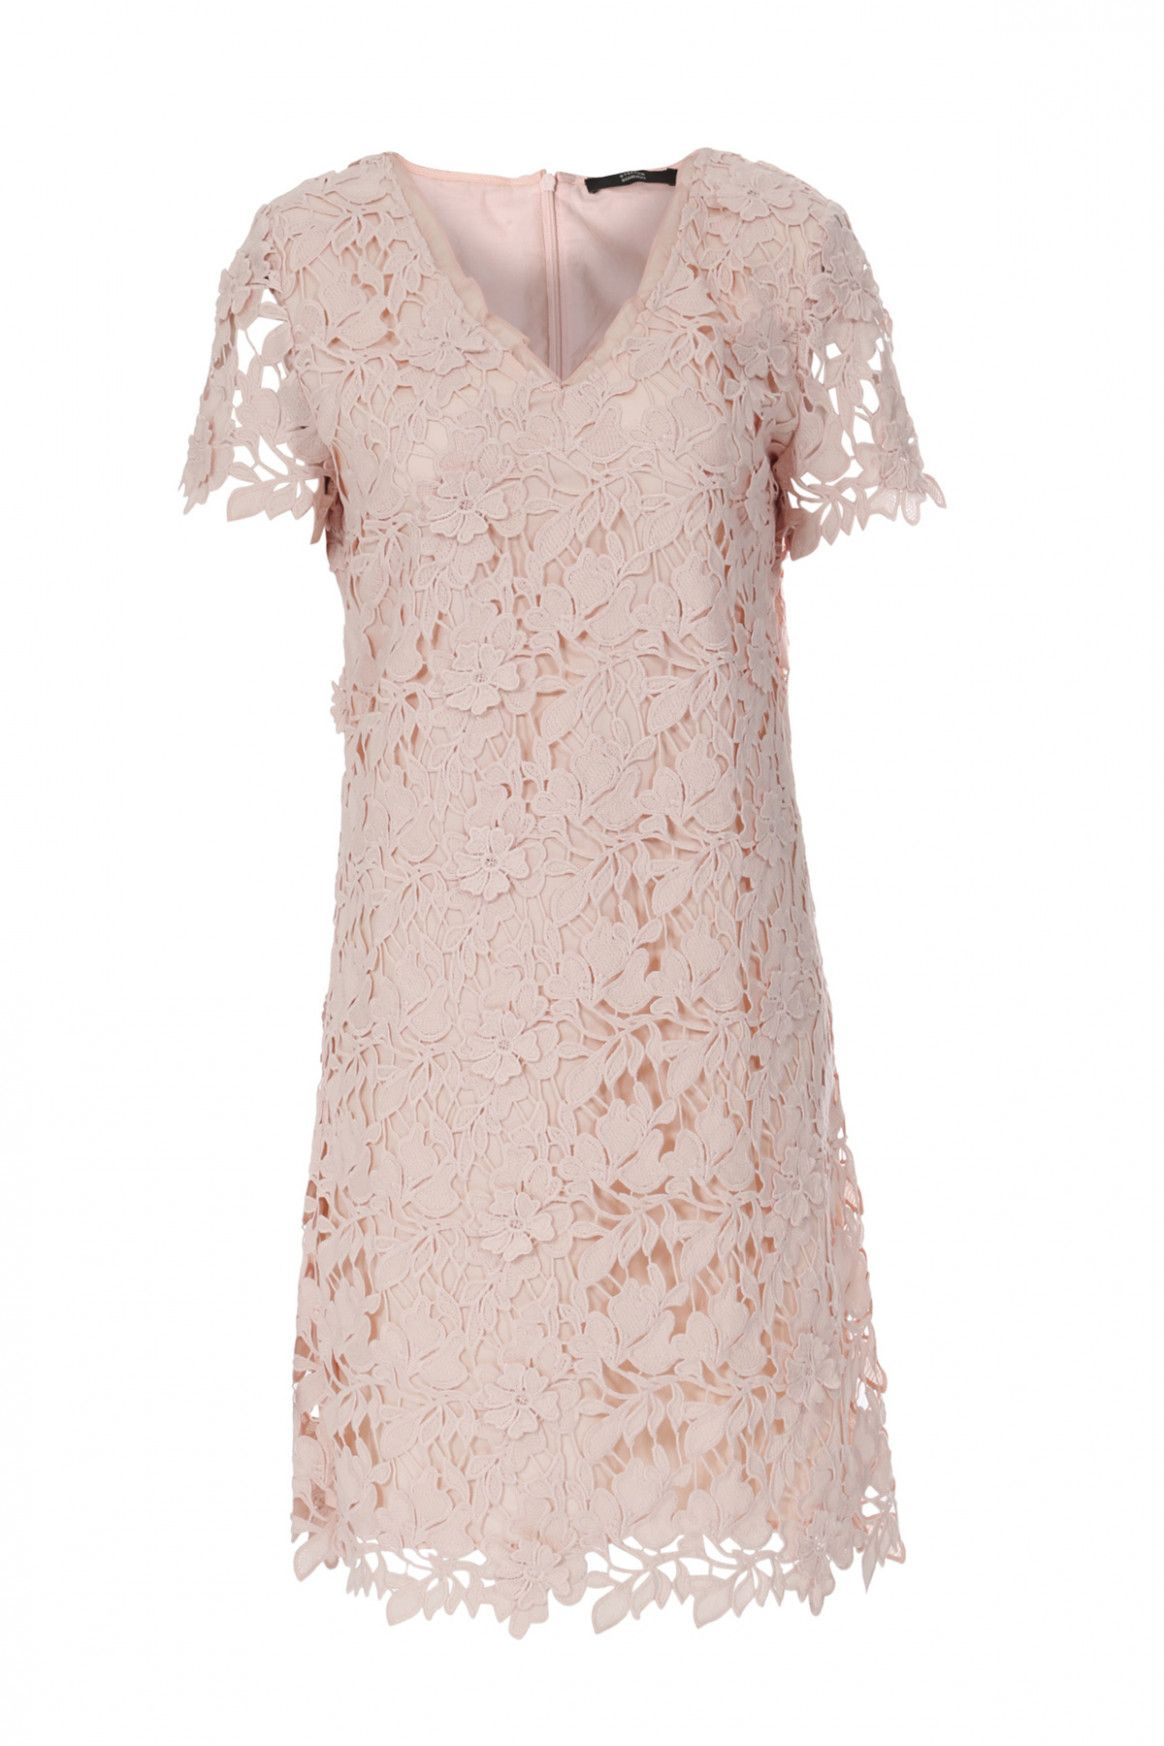 14 Kleid Altrosa Spitze in 14  Rosa kleid mit spitze, Kleid